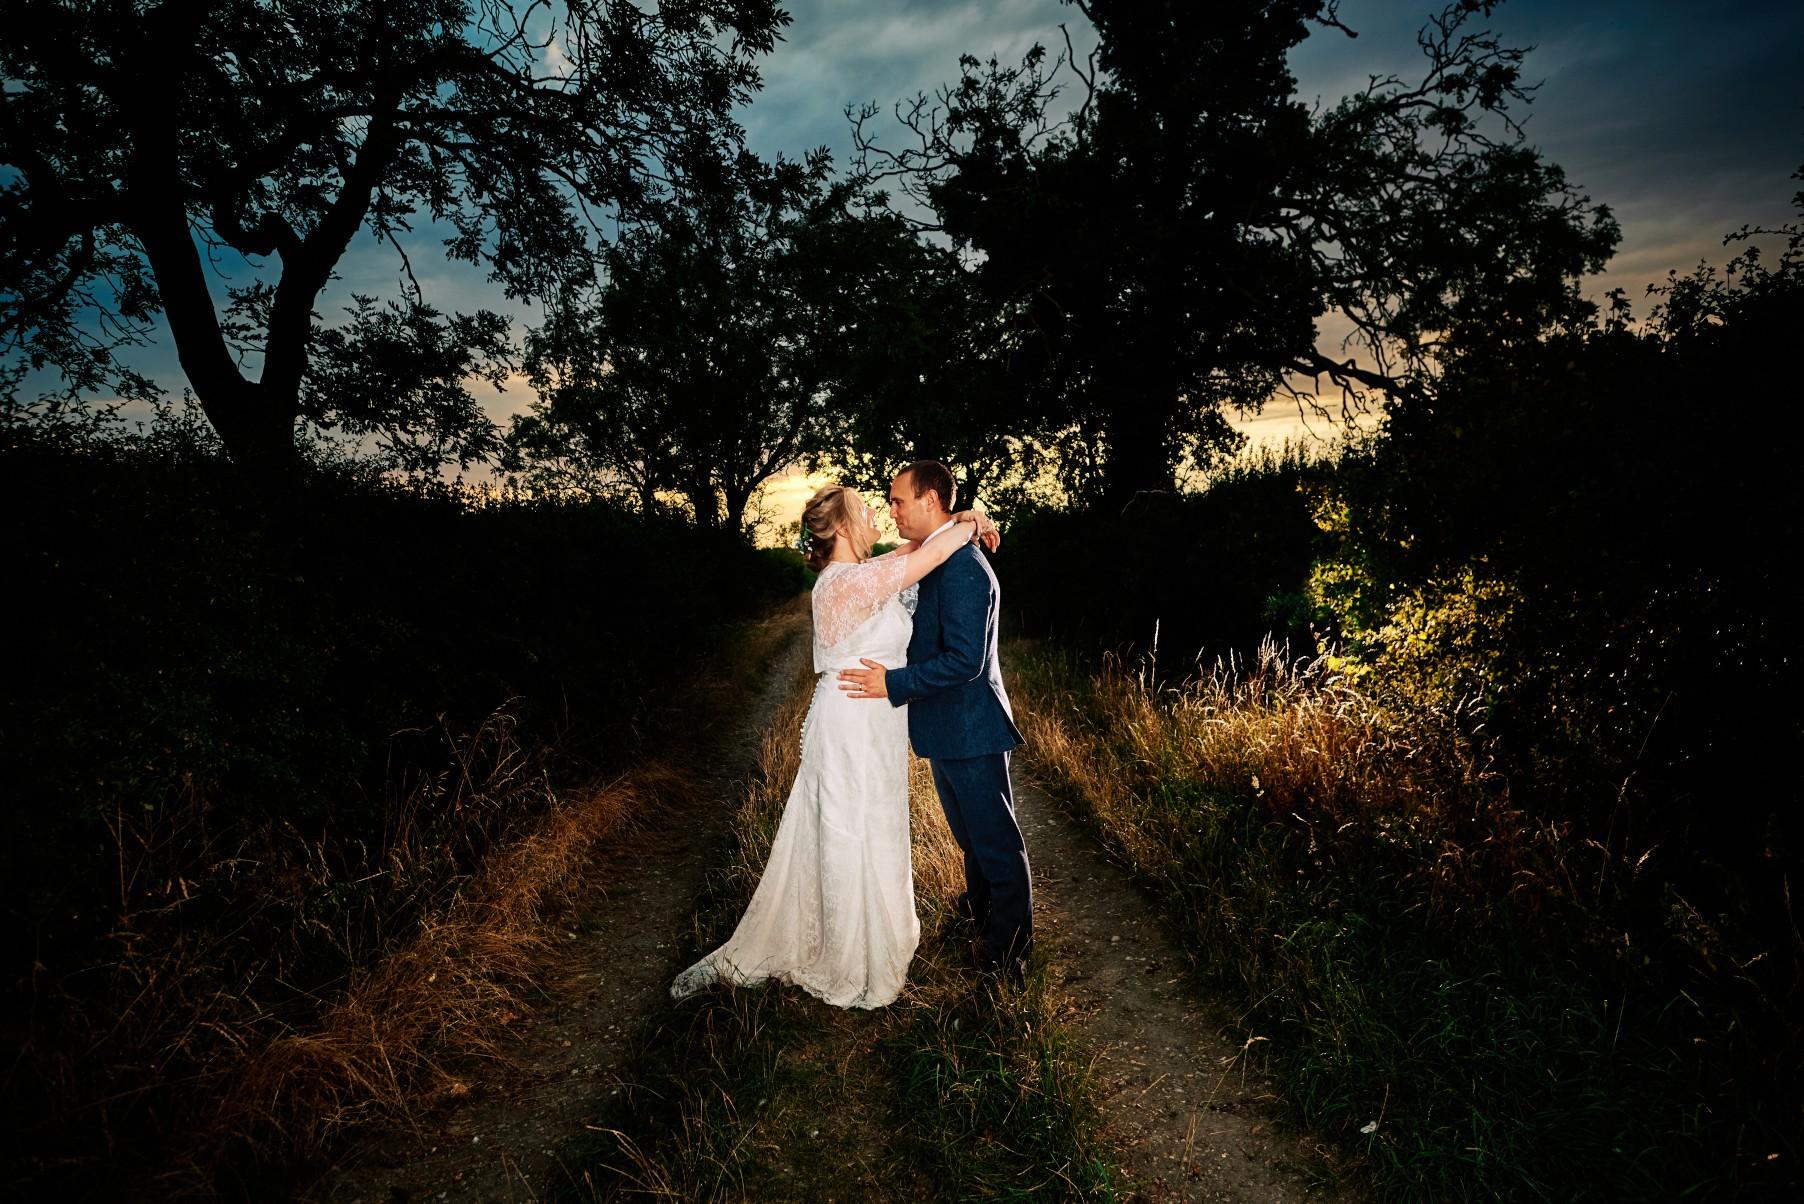 nhs wedding - paramedic wedding - blue and gold wedding - outdoor wedding - micro wedding - surprise wedding - romantic wedding photography